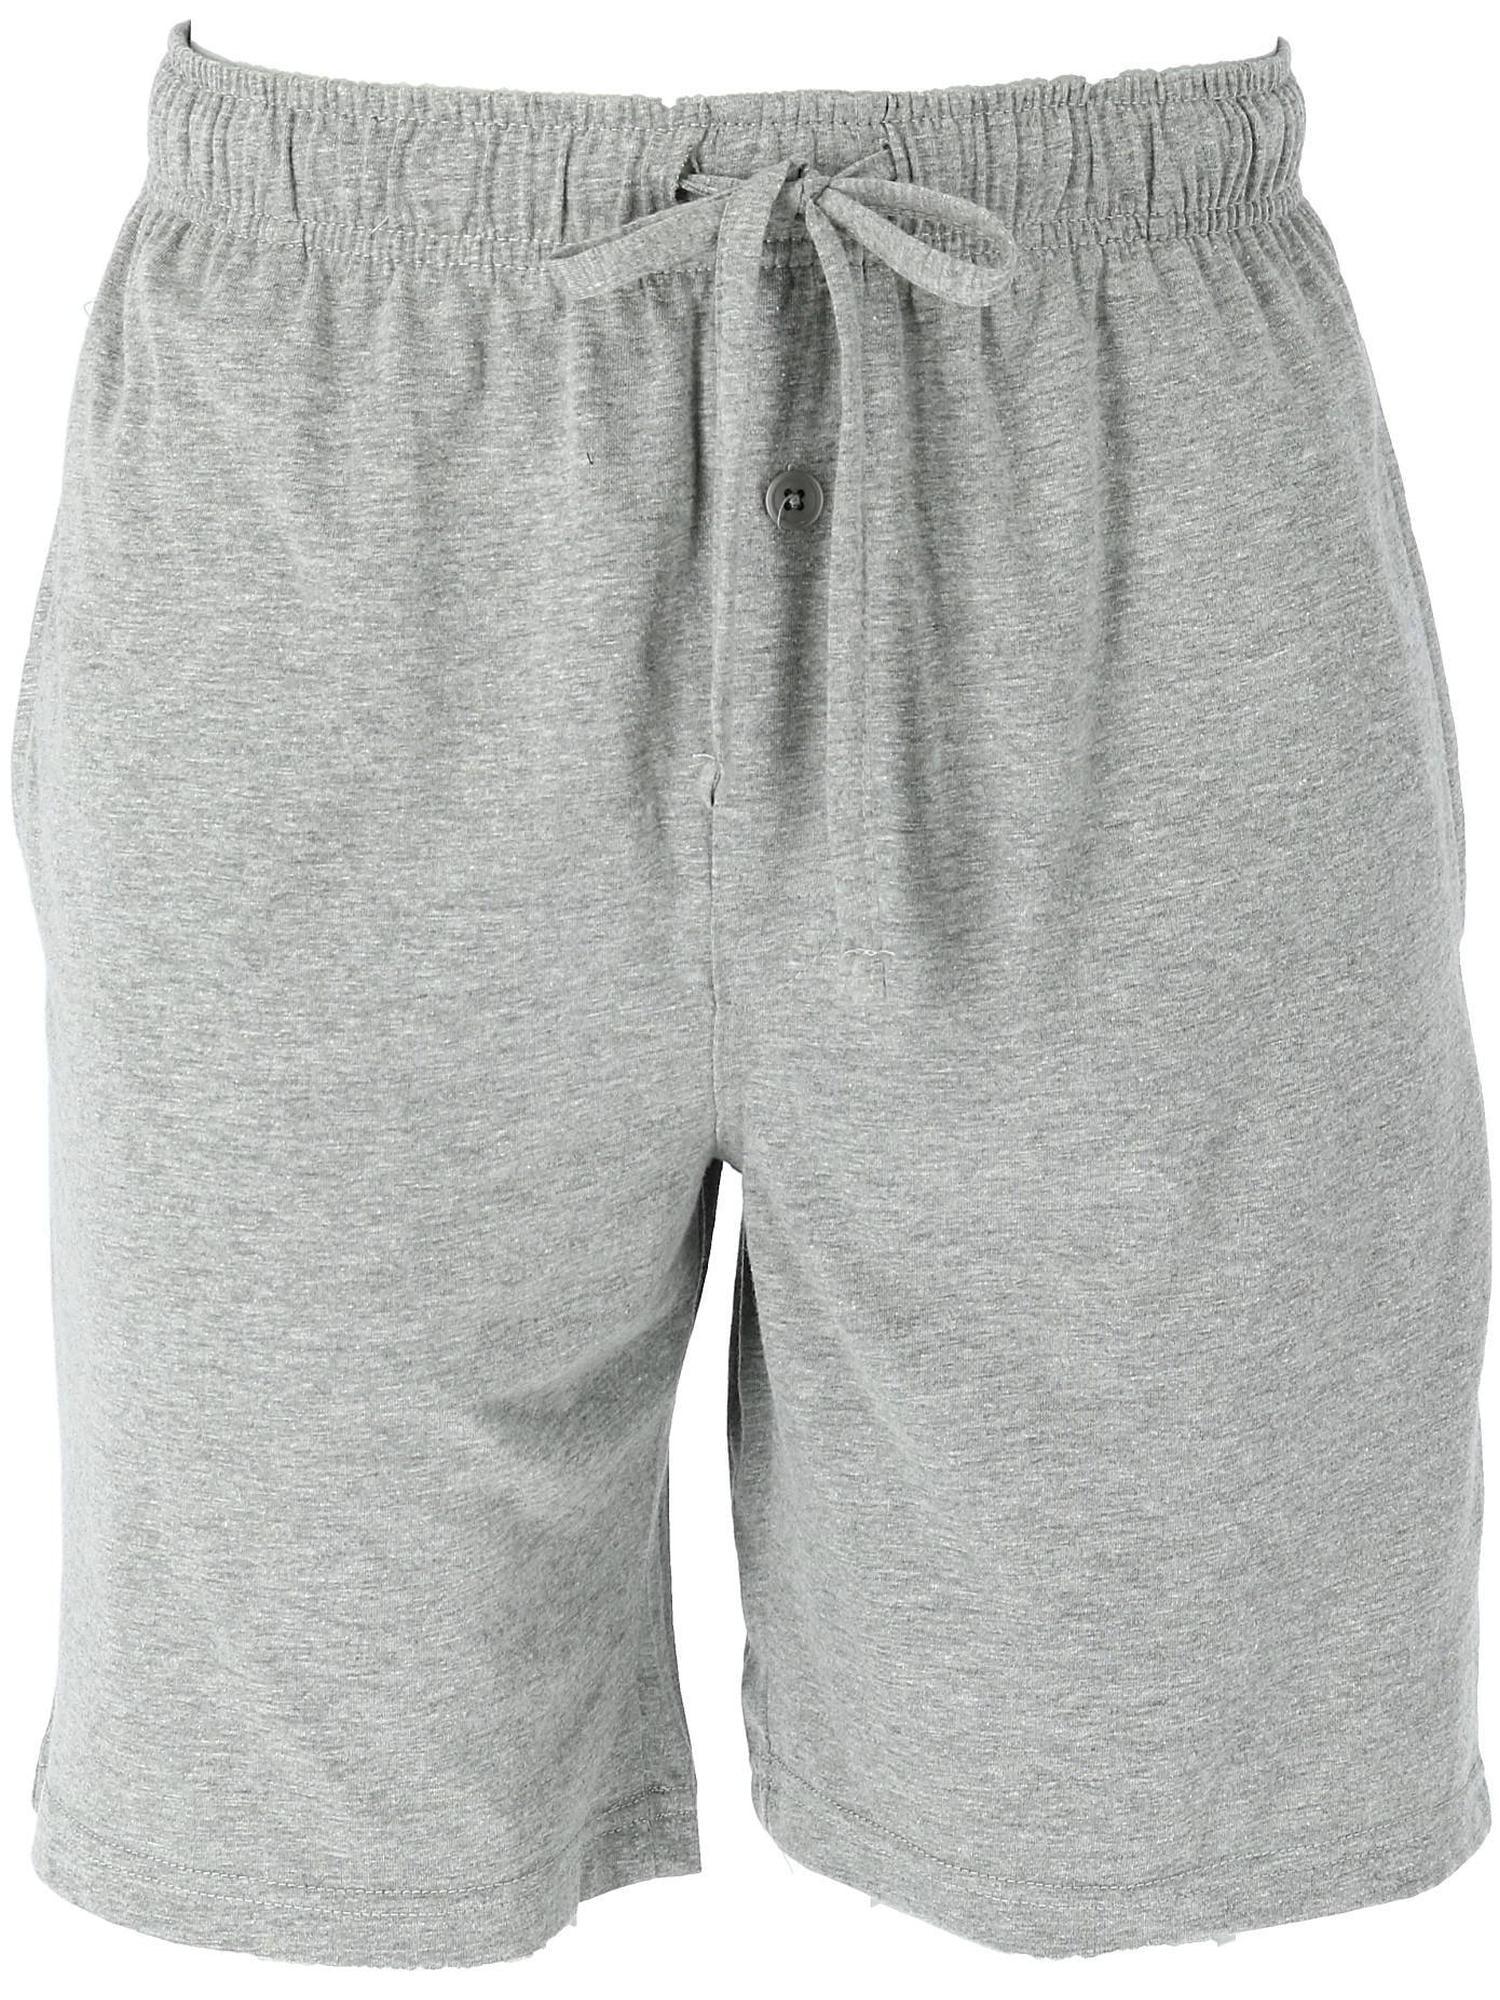 Pack of 2 Hanes Mens Big-Tall Knit Sleep Short